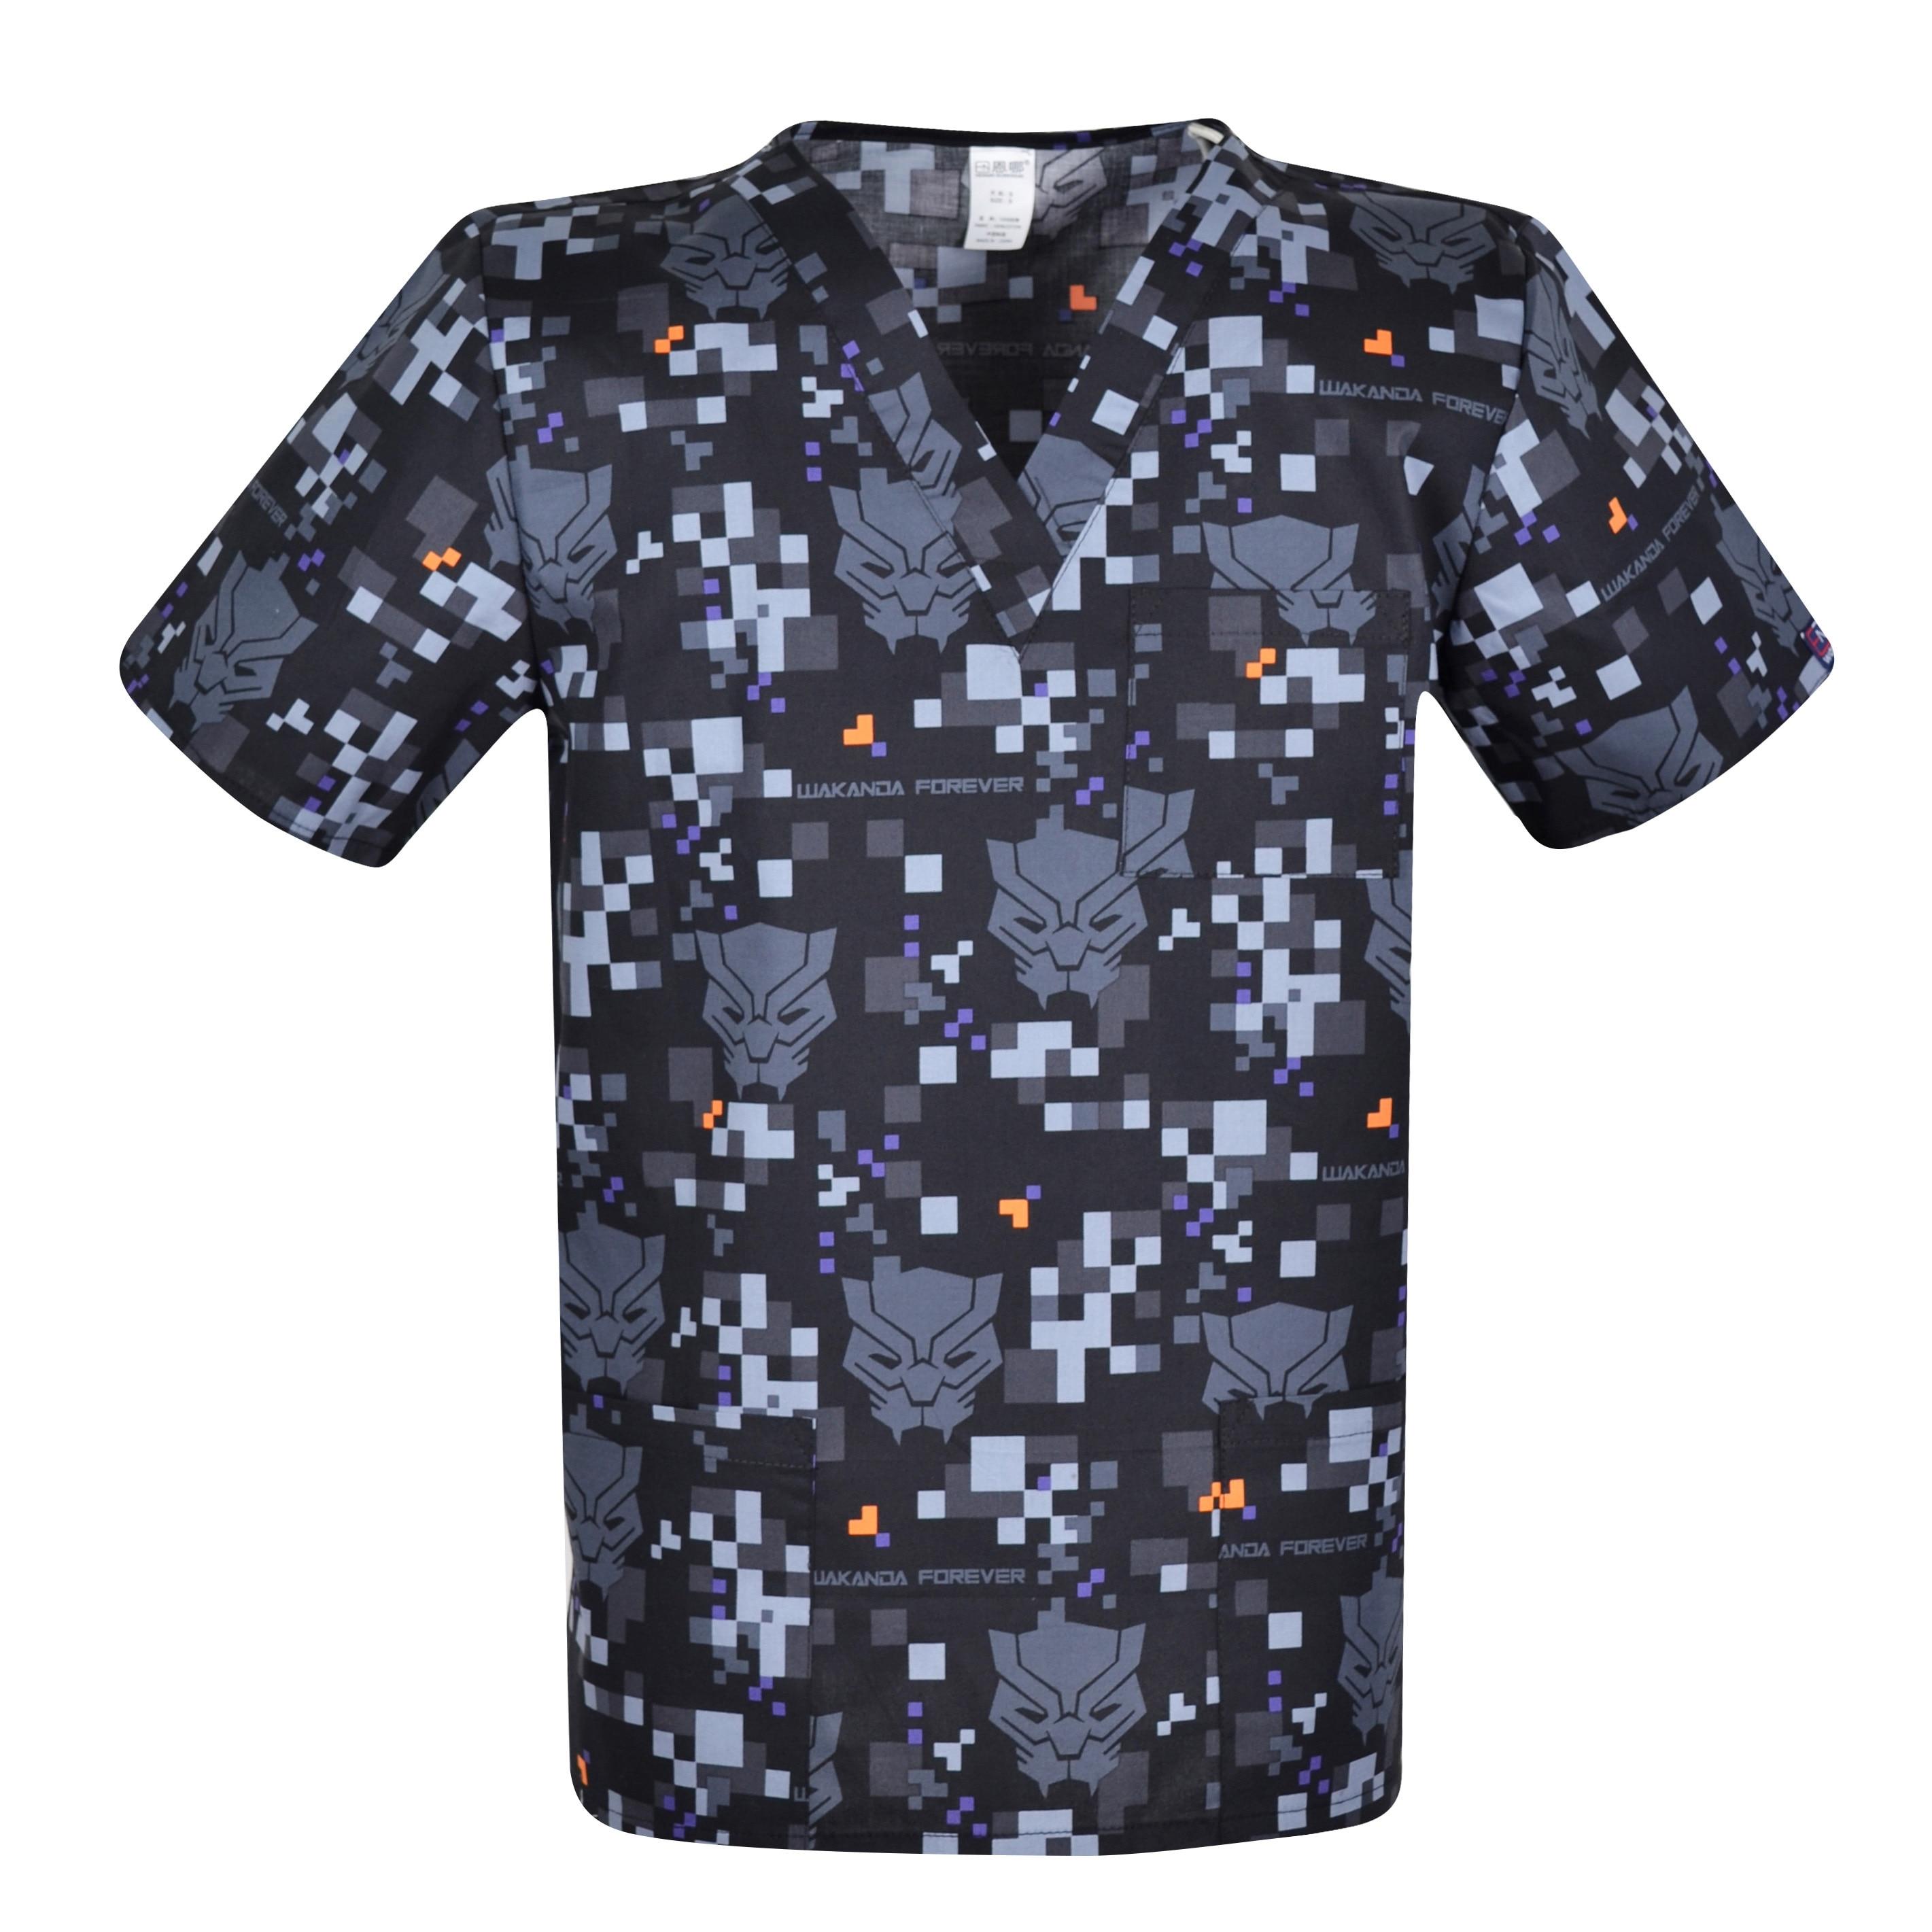 Print Men Medical Uniforms,print Men Scrub Top,men Medical Tops   Medical Uniform For Male In 100% Cotton